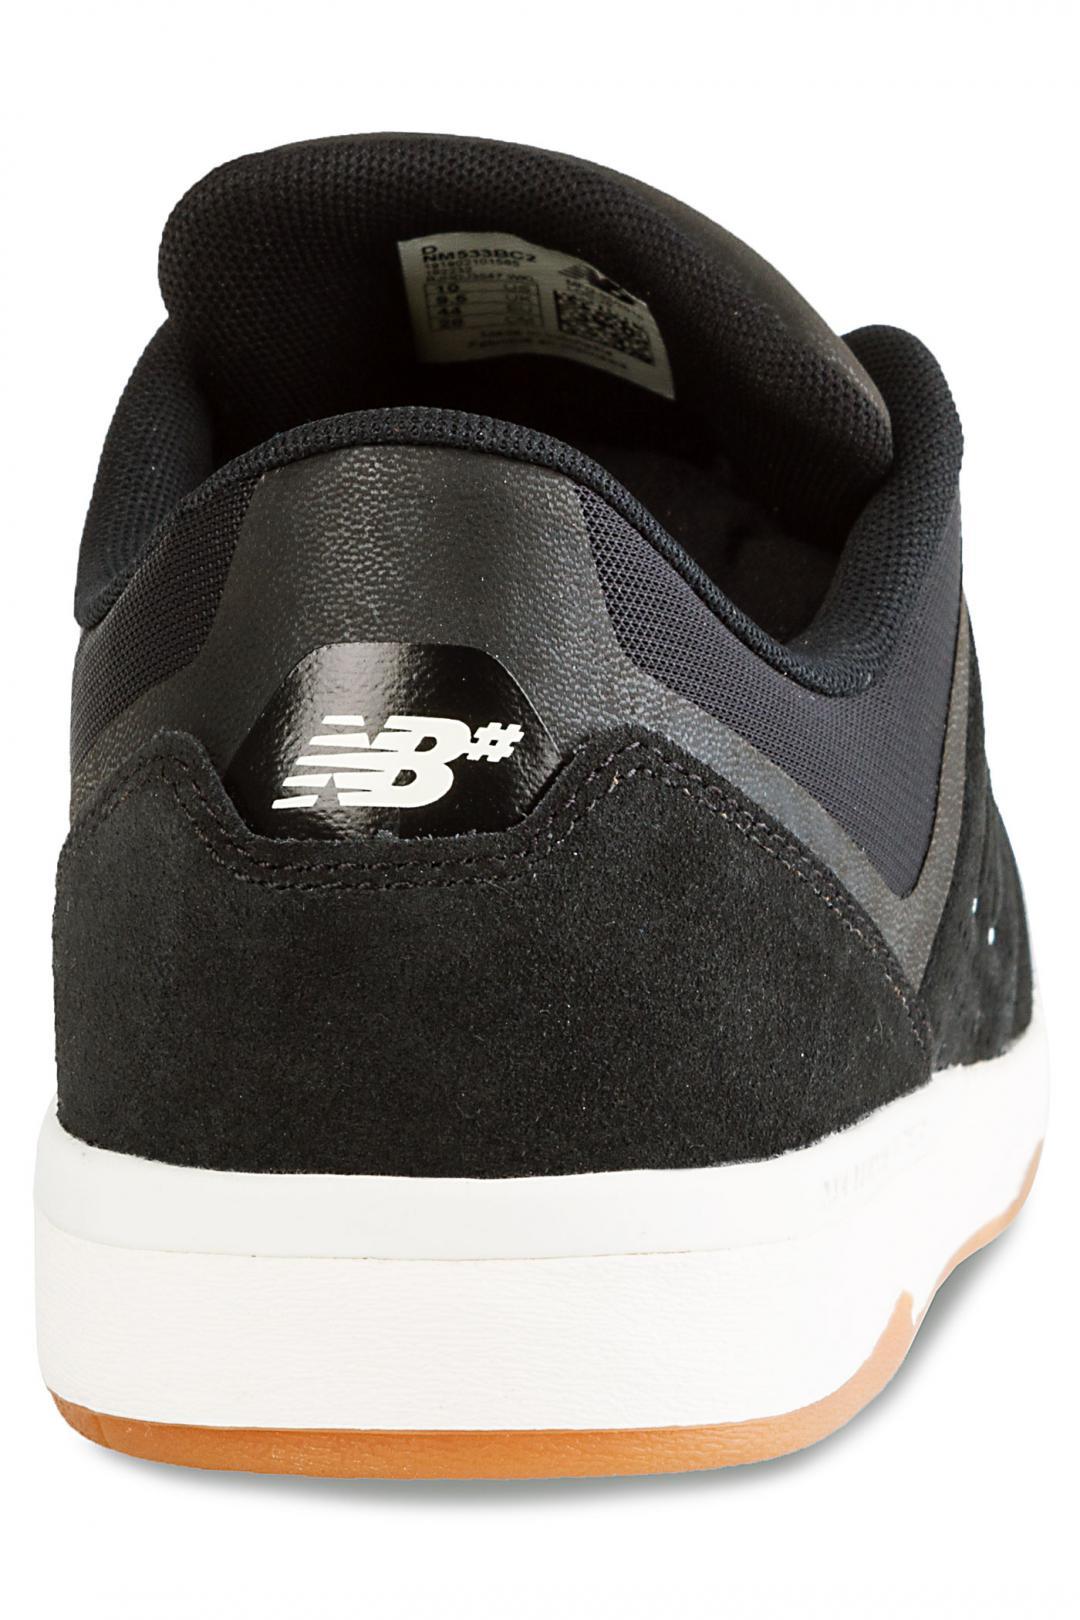 Uomo New Balance Numeric 533 v2 black white gum | Sneaker